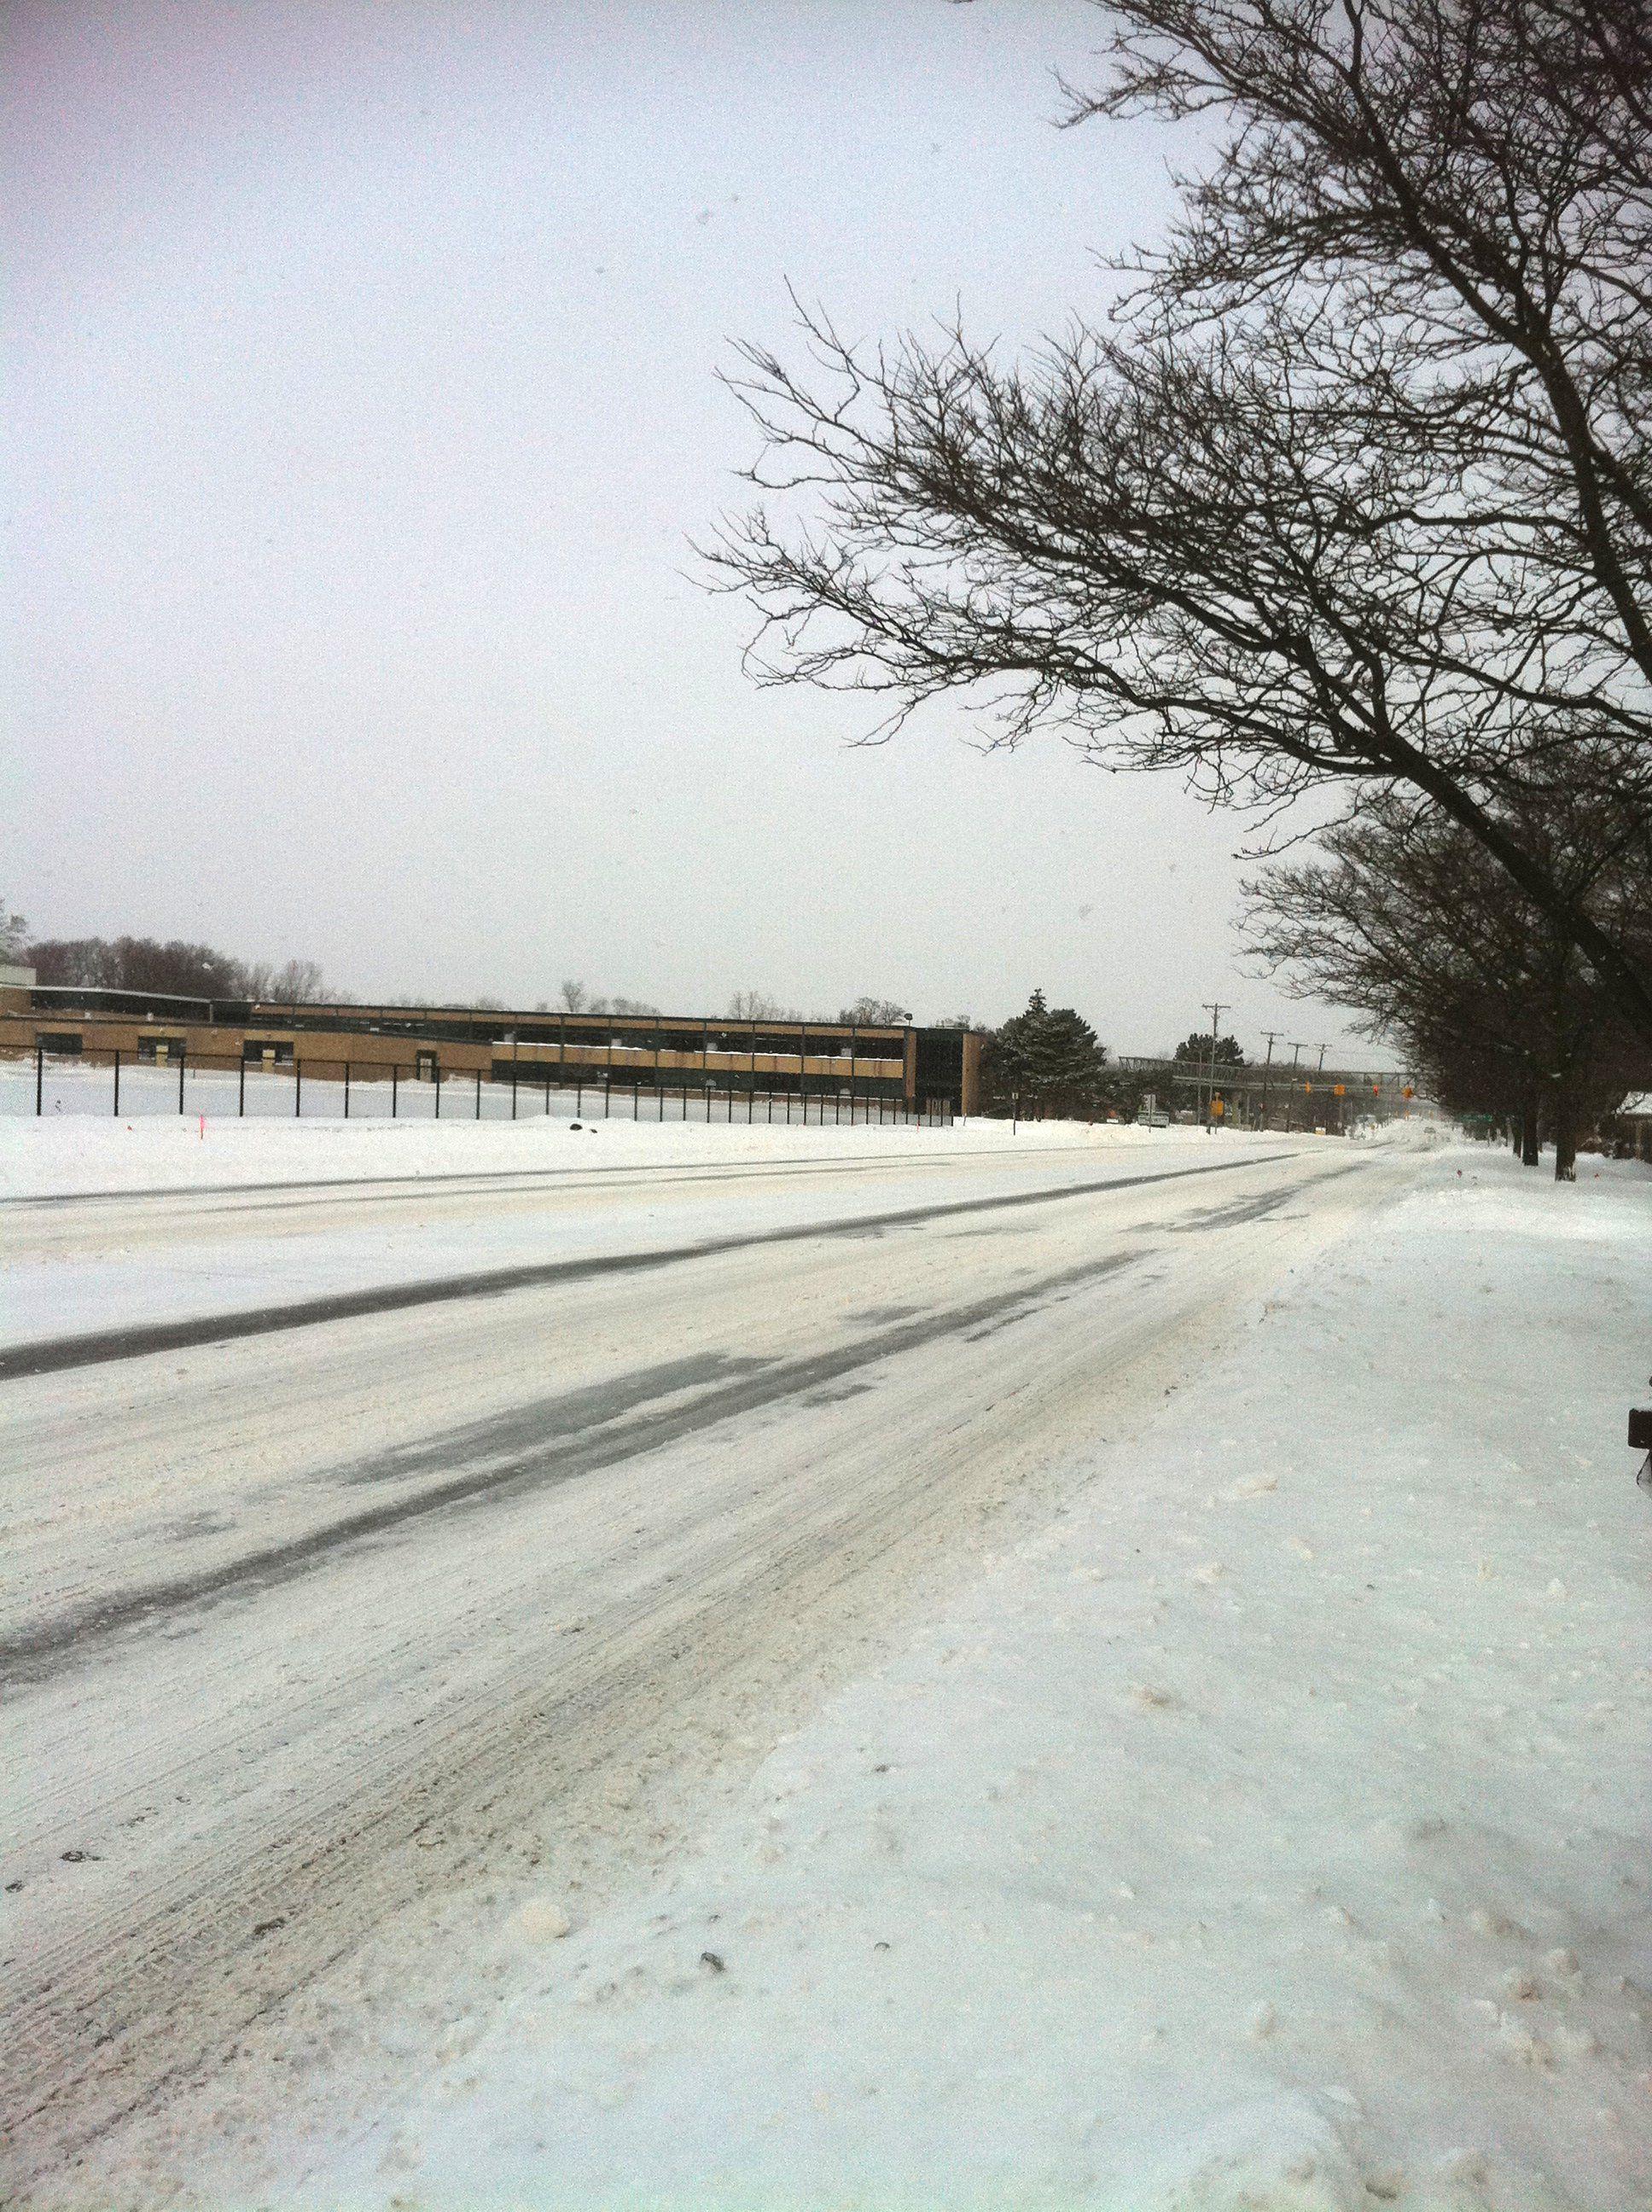 January snow in Metro Detroit